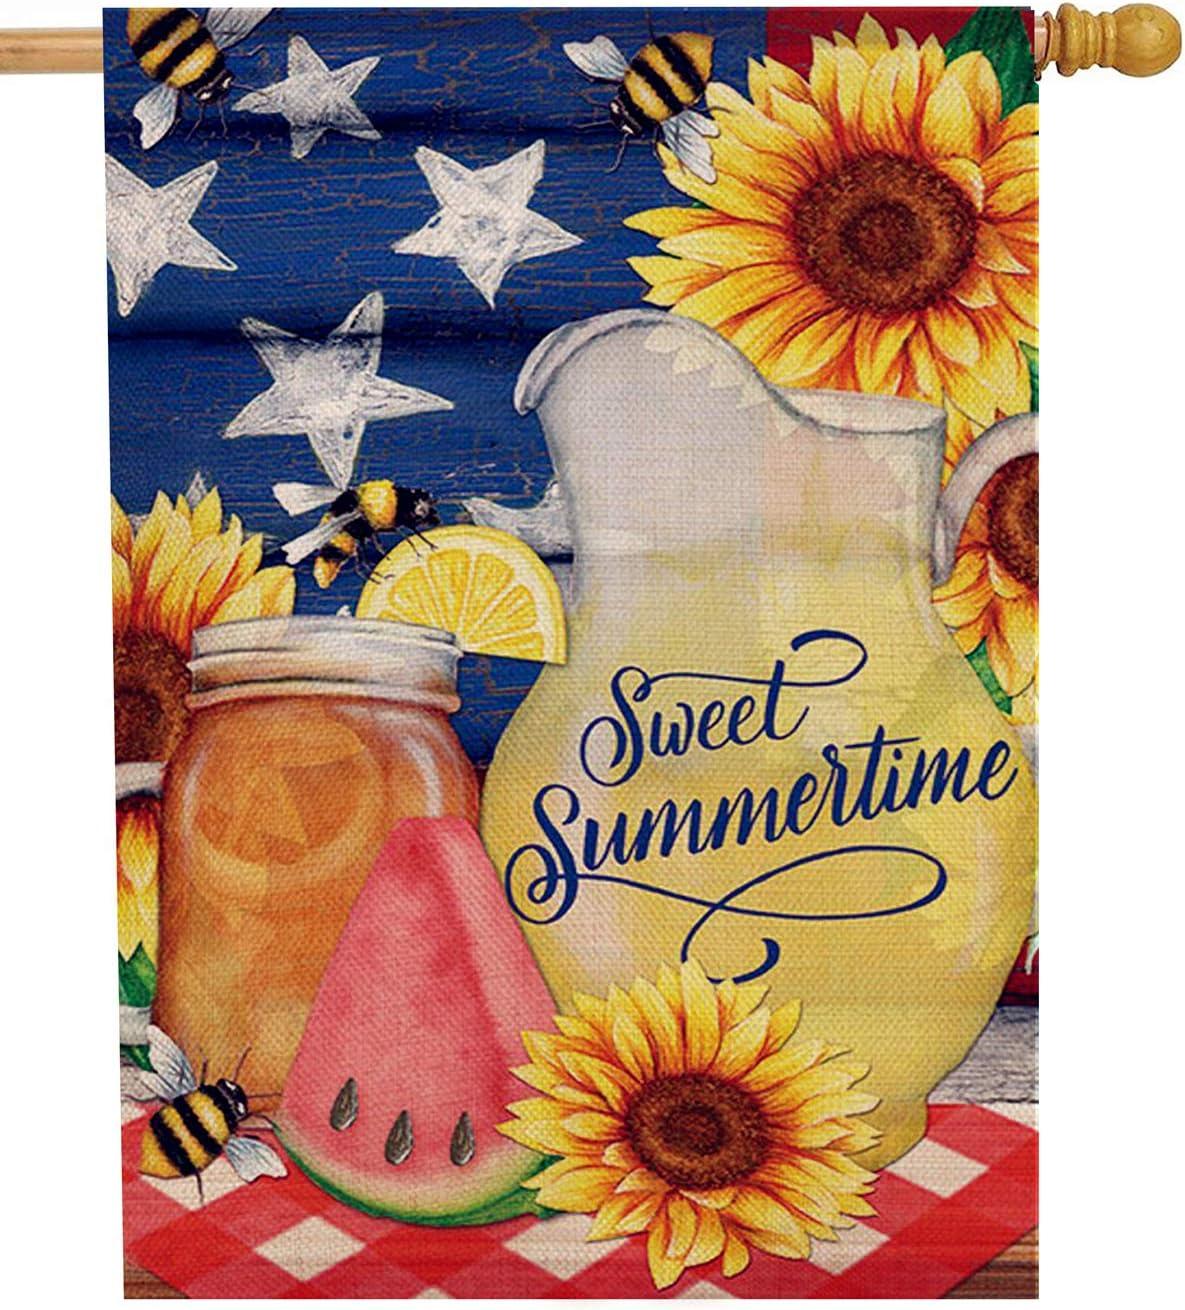 Dyrenson Watermelon Flower 28 x 40 House Flag Summer Double Sided, Sunflower Mason Jar Burlap Garden Yard Decoration Patriotic Star, Floral Seasonal Outdoor Décor Decorative Spring Large Flag Lemon